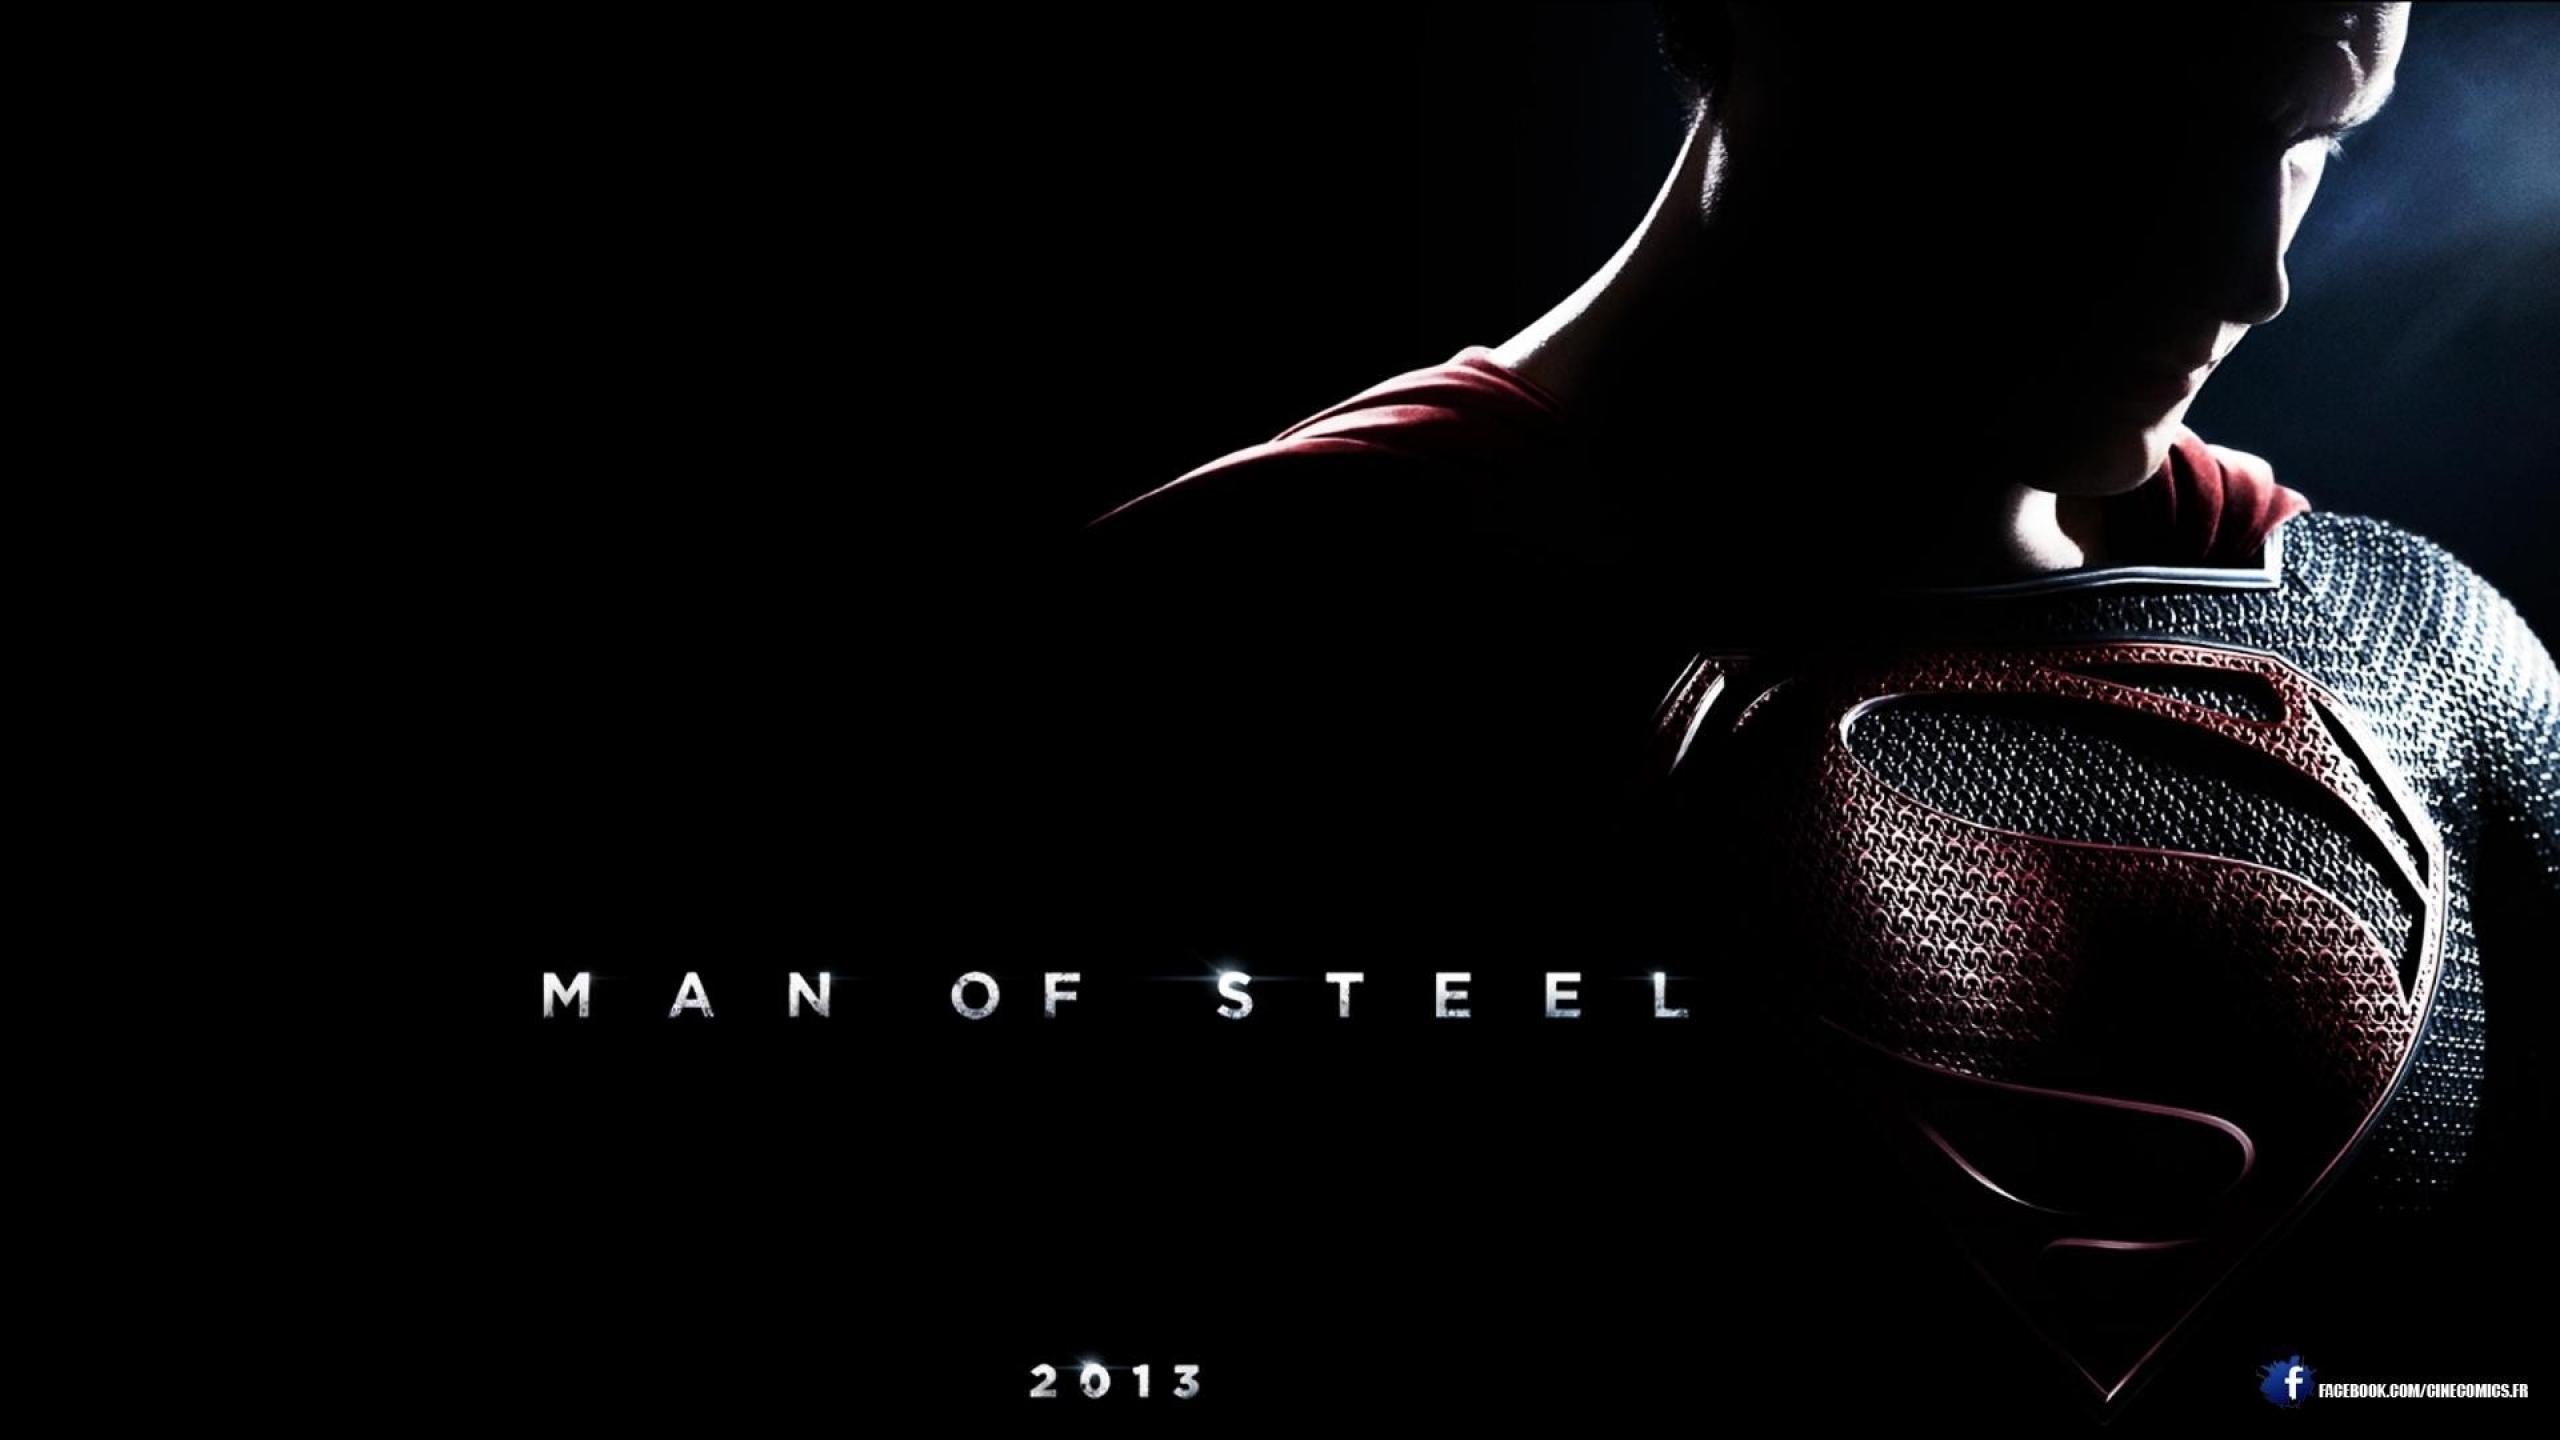 man of steel movie 1920x1080 wallpaper High Resolution WallpaperHi 2560x1440